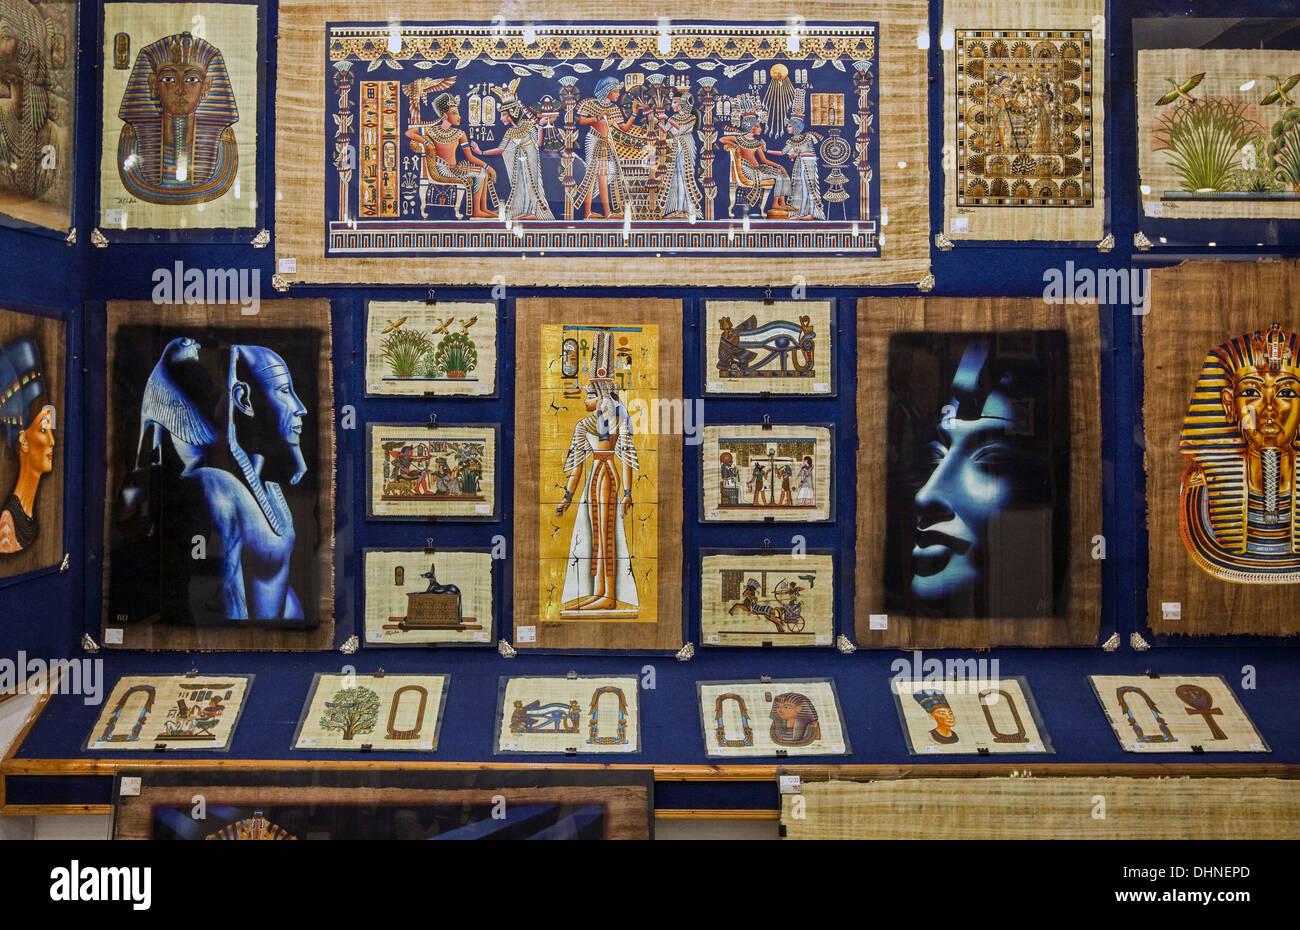 papyrus egypt stockfotos papyrus egypt bilder alamy. Black Bedroom Furniture Sets. Home Design Ideas